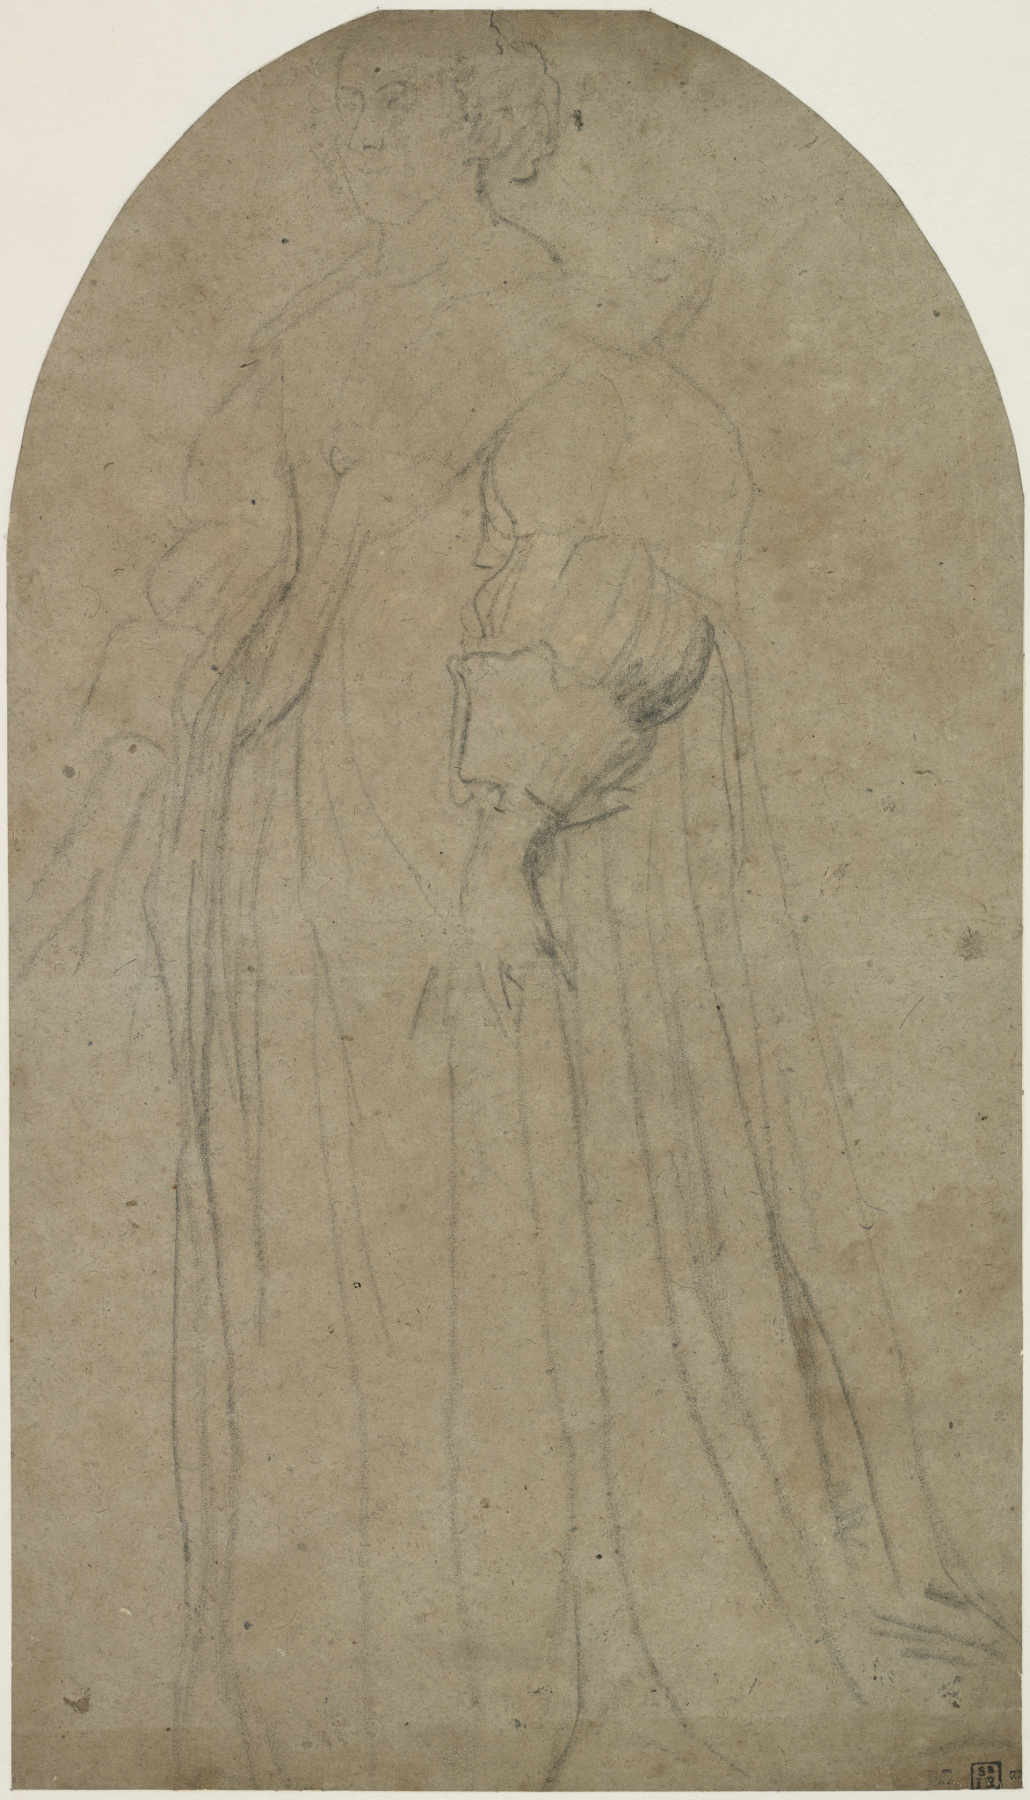 Anthony van Dyck. Sketch for the portrait of Henrietta of Lorraine